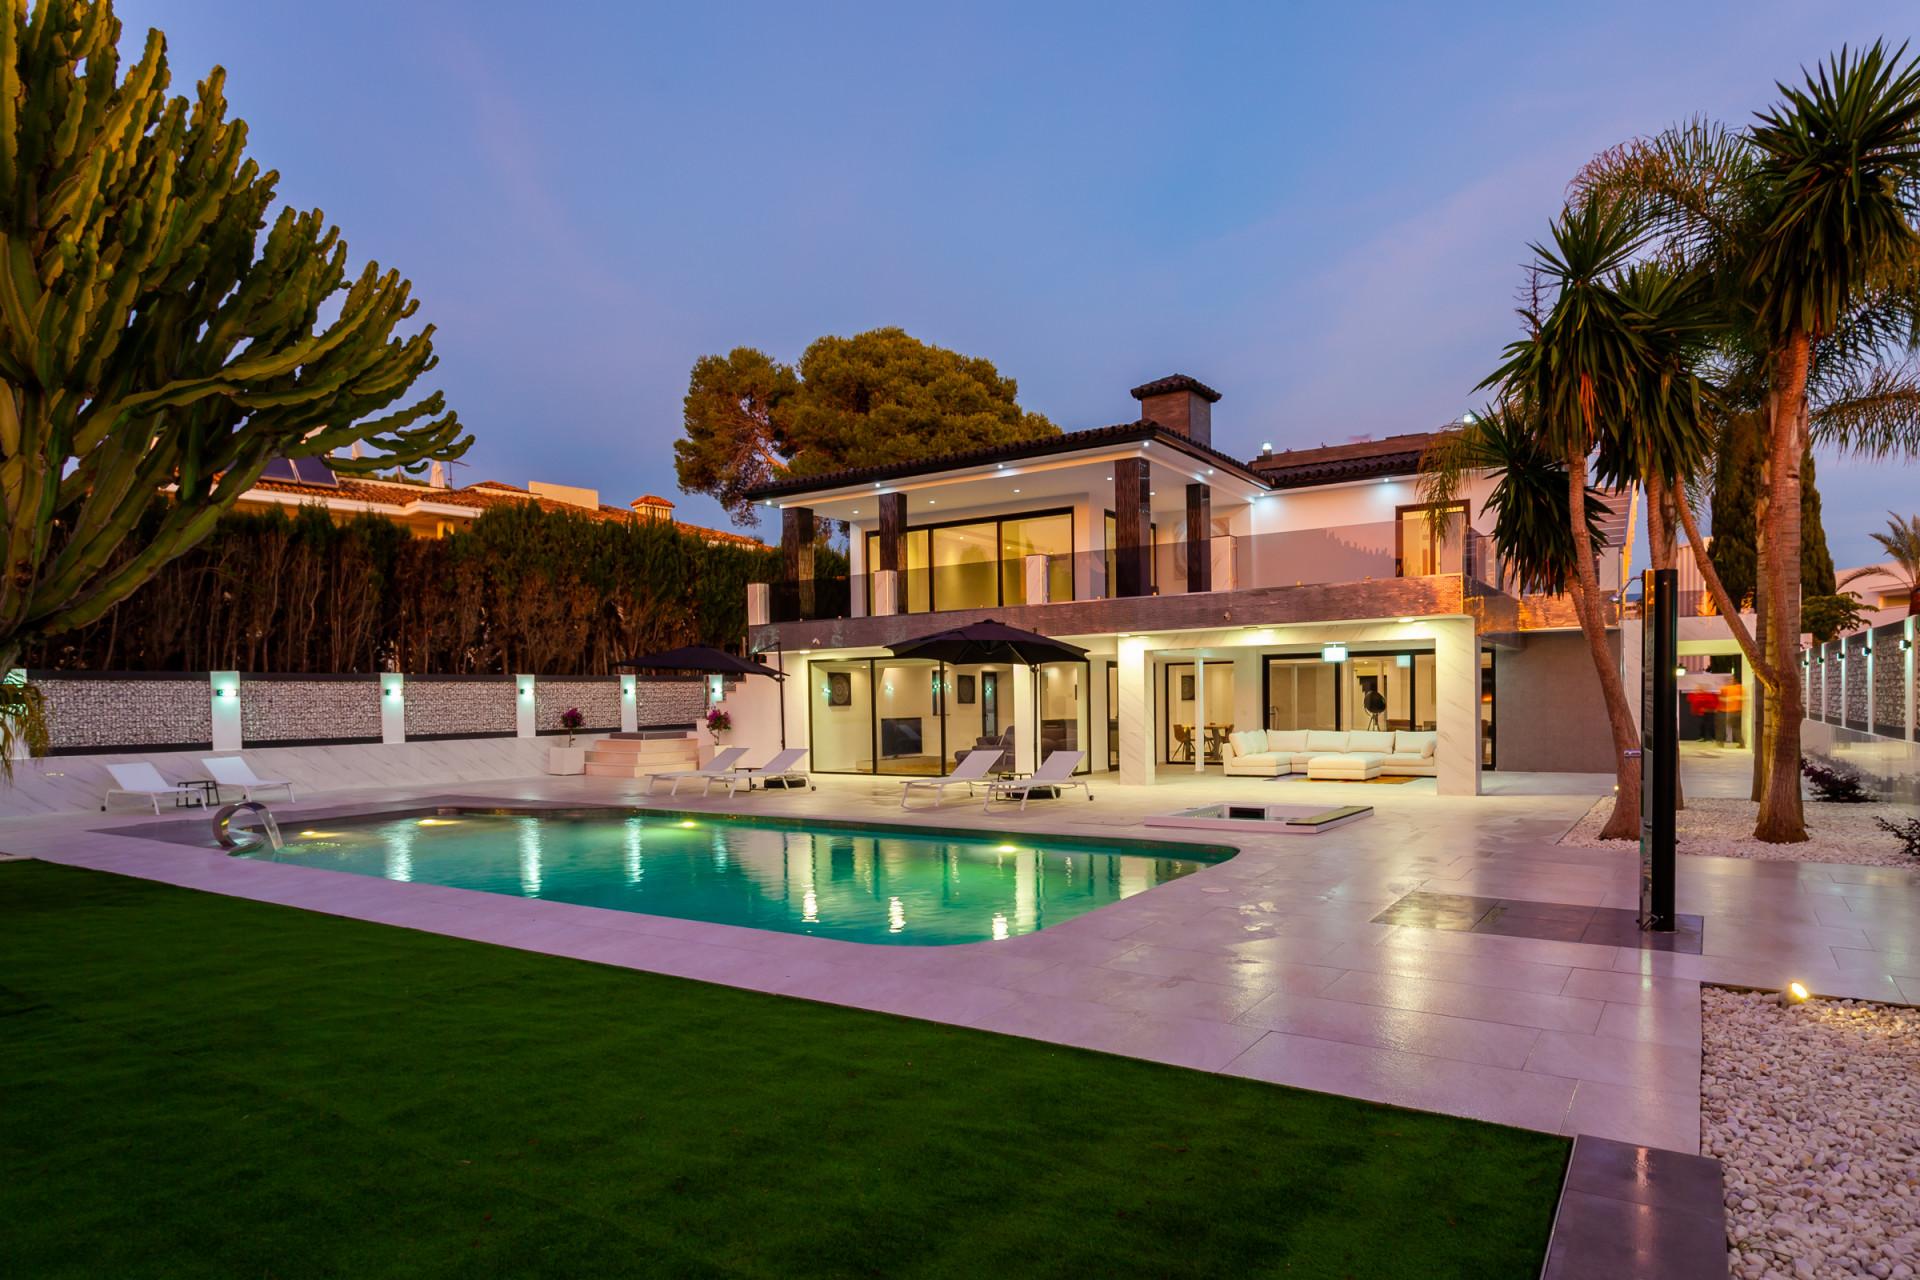 ARFV2050 - Fantastische Villa in Strandlage zum Verkauf in Los Monteros Playa Marbella